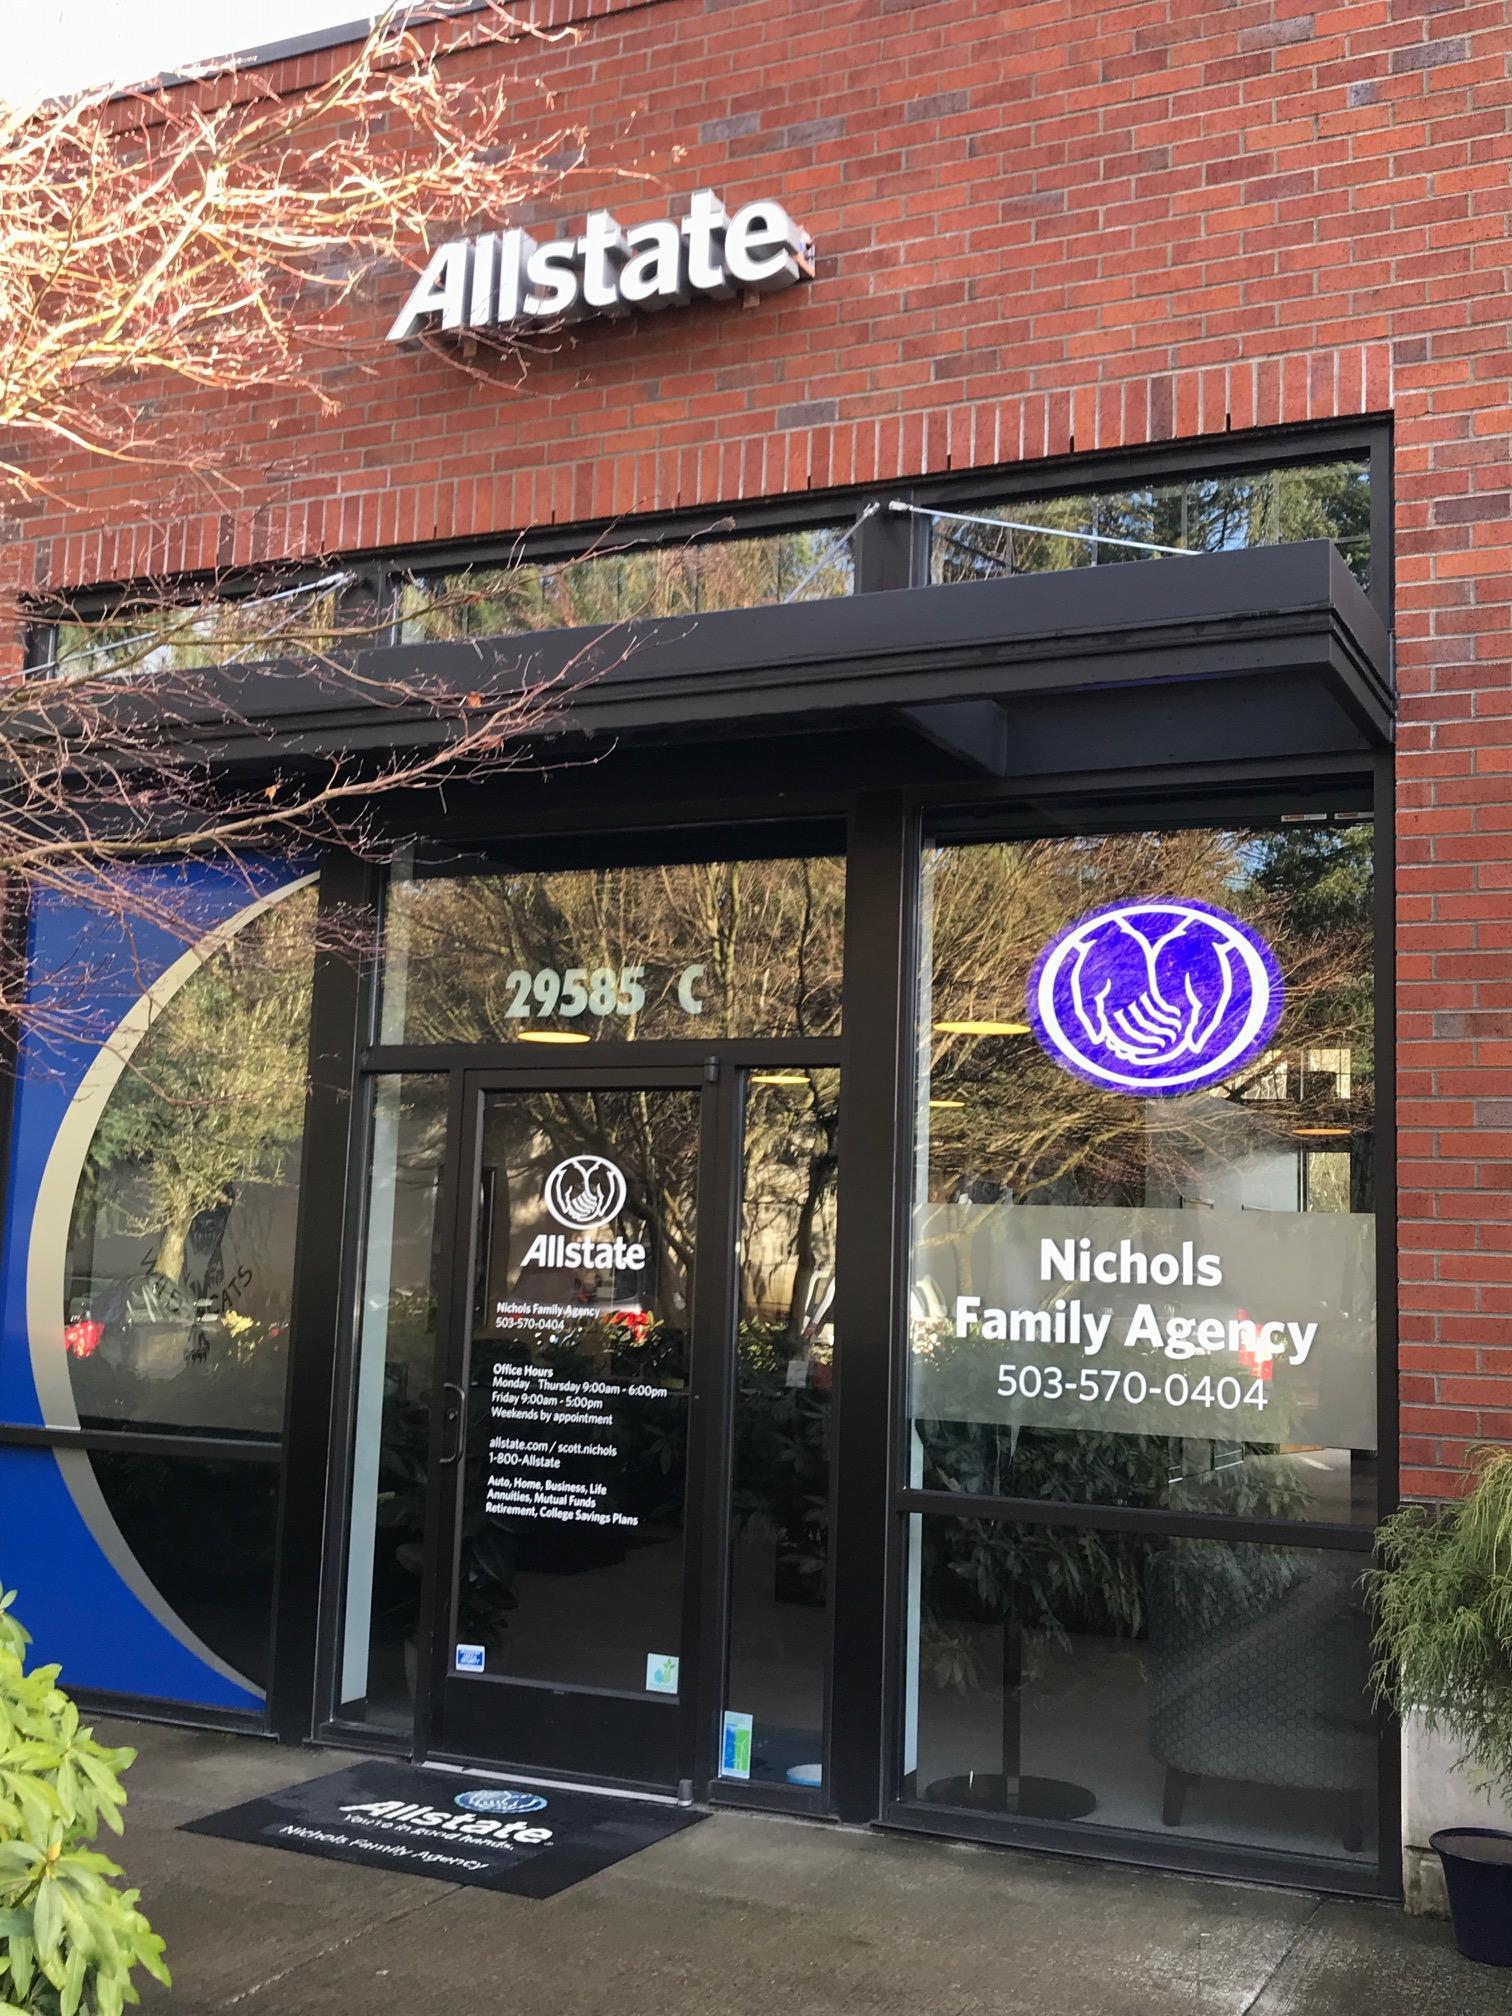 Nichols Family Agency: Allstate Insurance image 9